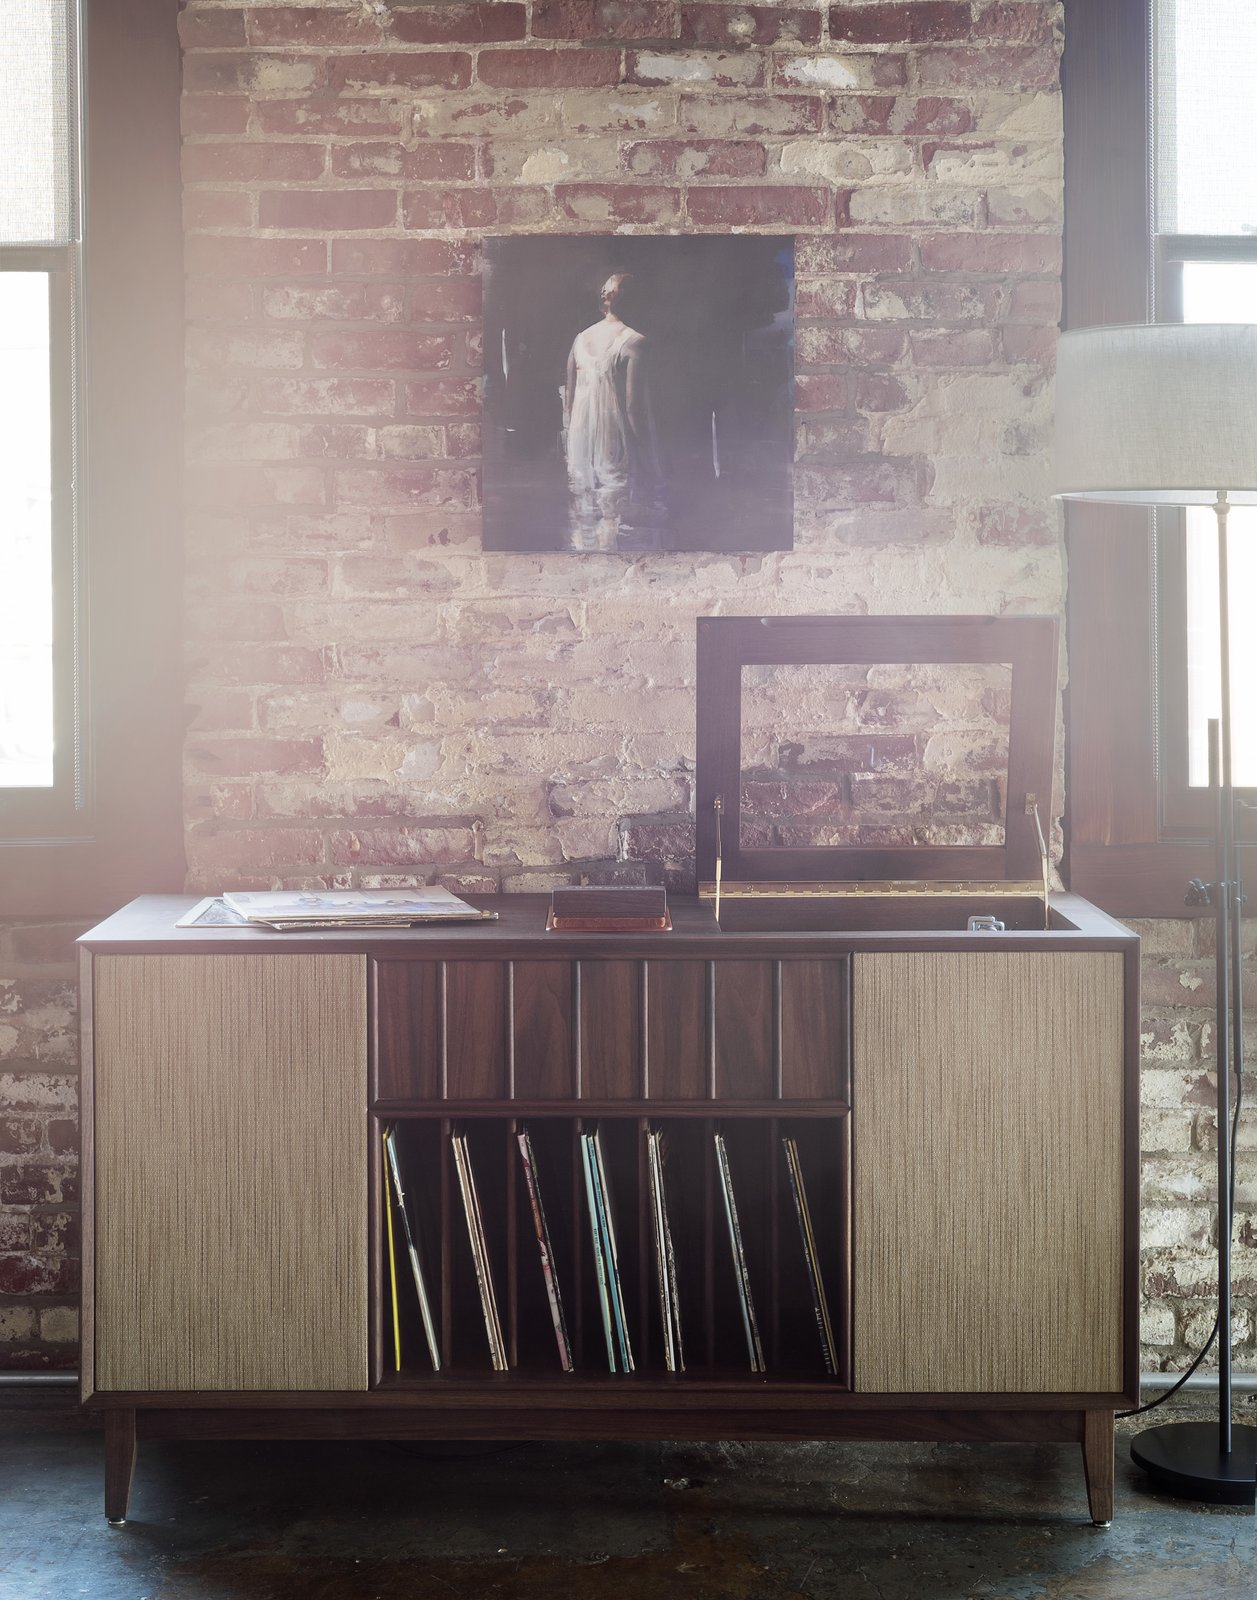 Tagged: Storage Room. Mulherin's Hotel by Daniel Olsovsky